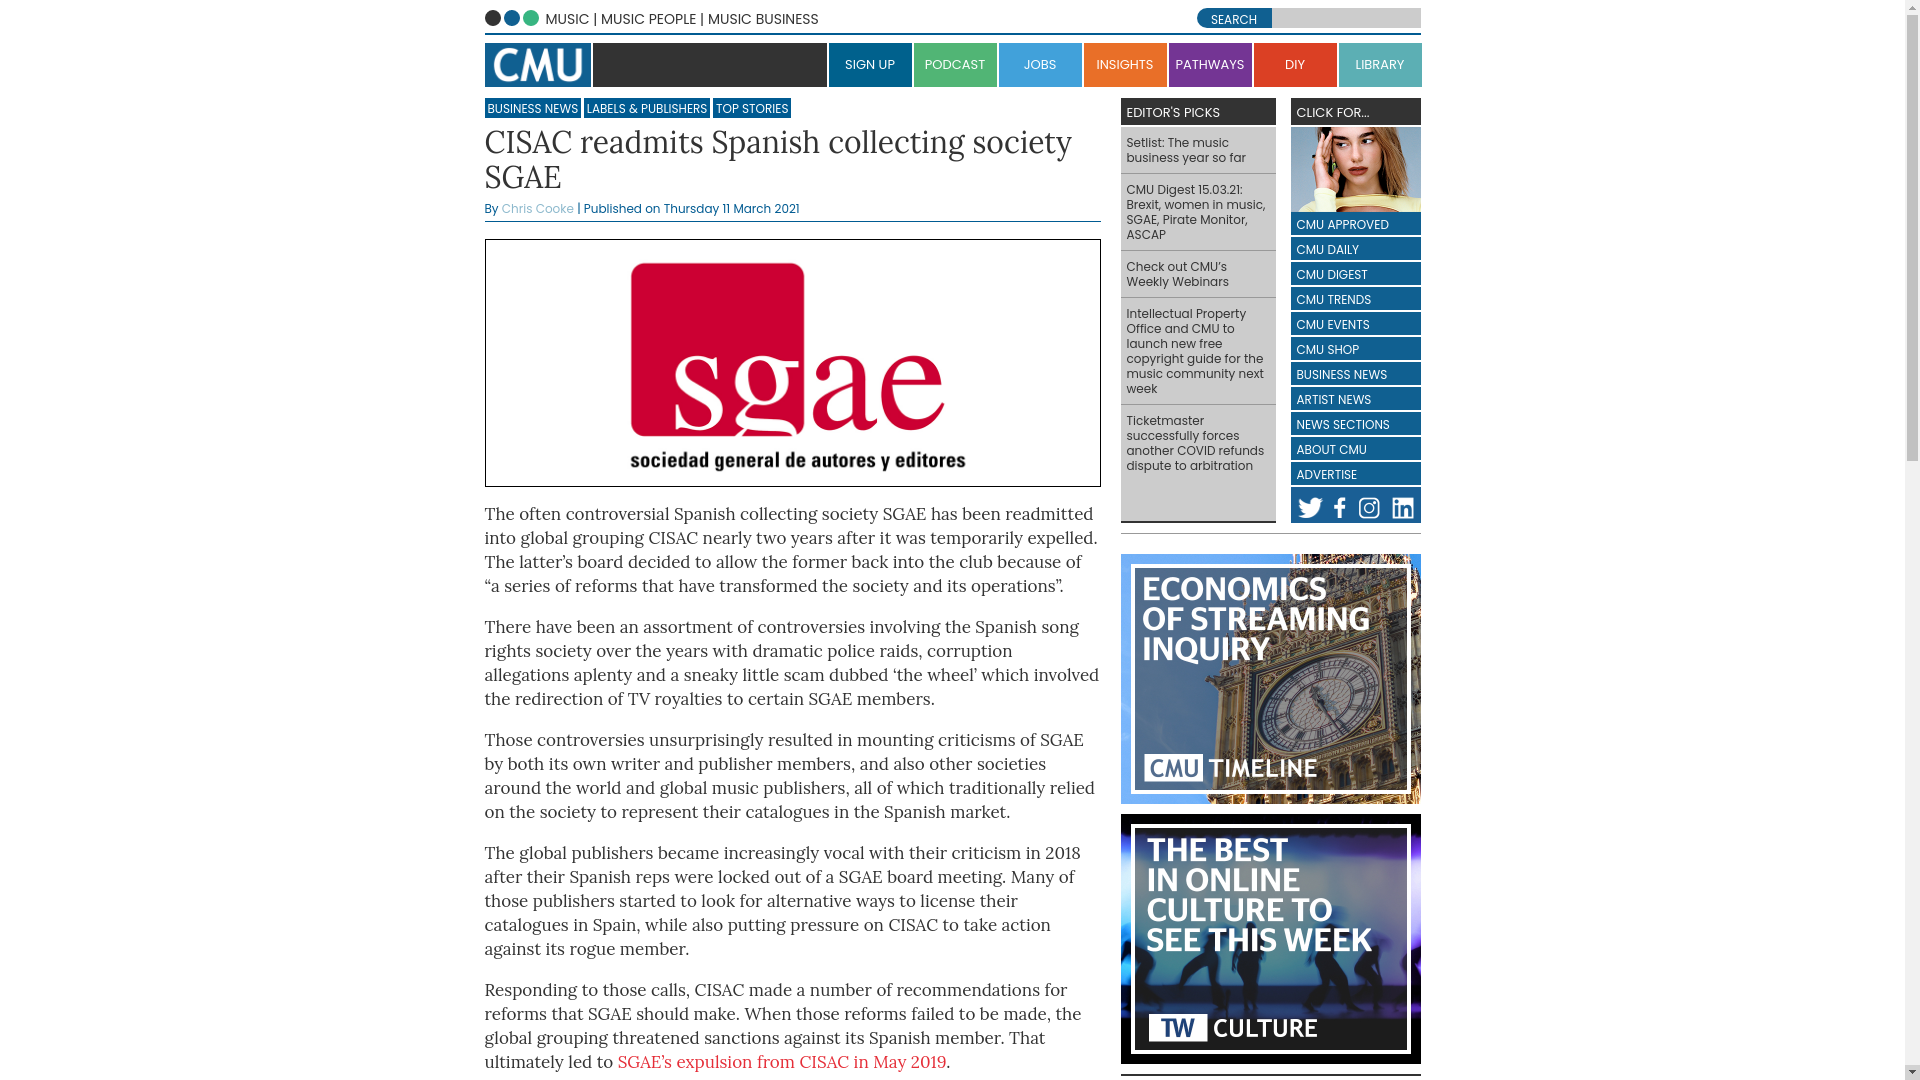 Fairness Rocks News CISAC readmits Spanish collecting society SGAE